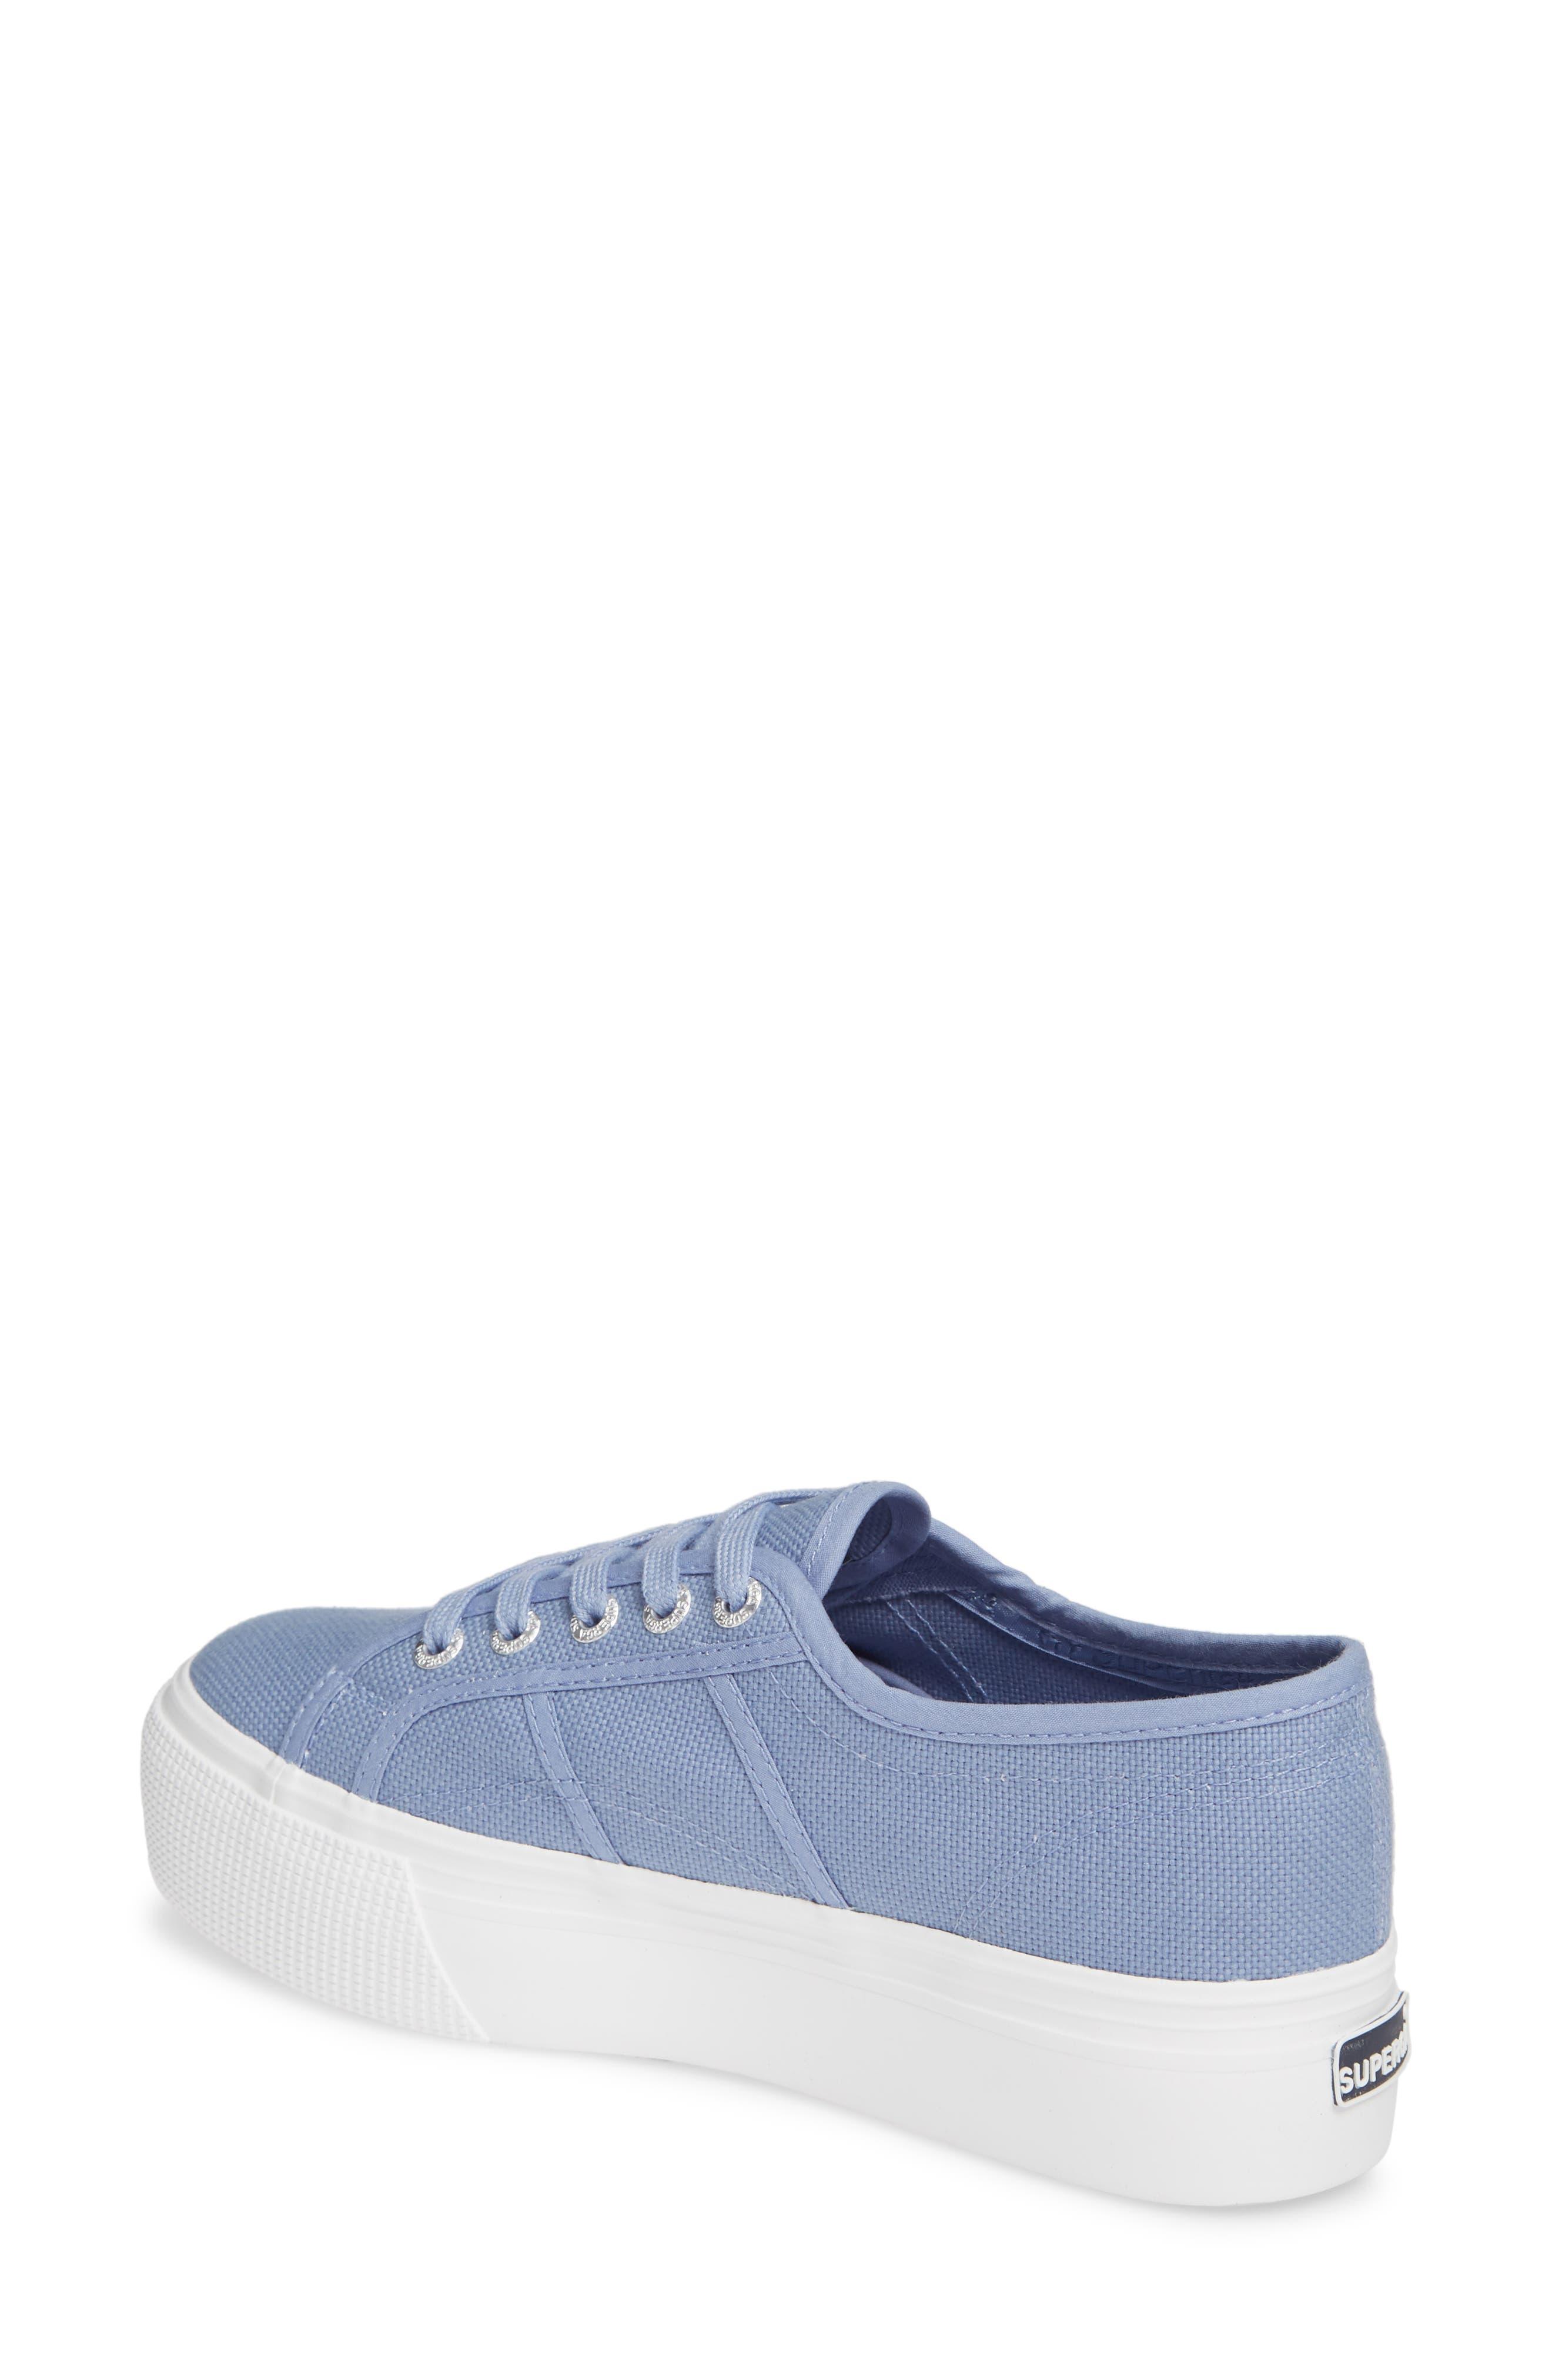 'Acot Linea' Sneaker,                             Alternate thumbnail 2, color,                             BLUE/ LIGHT PURPLE